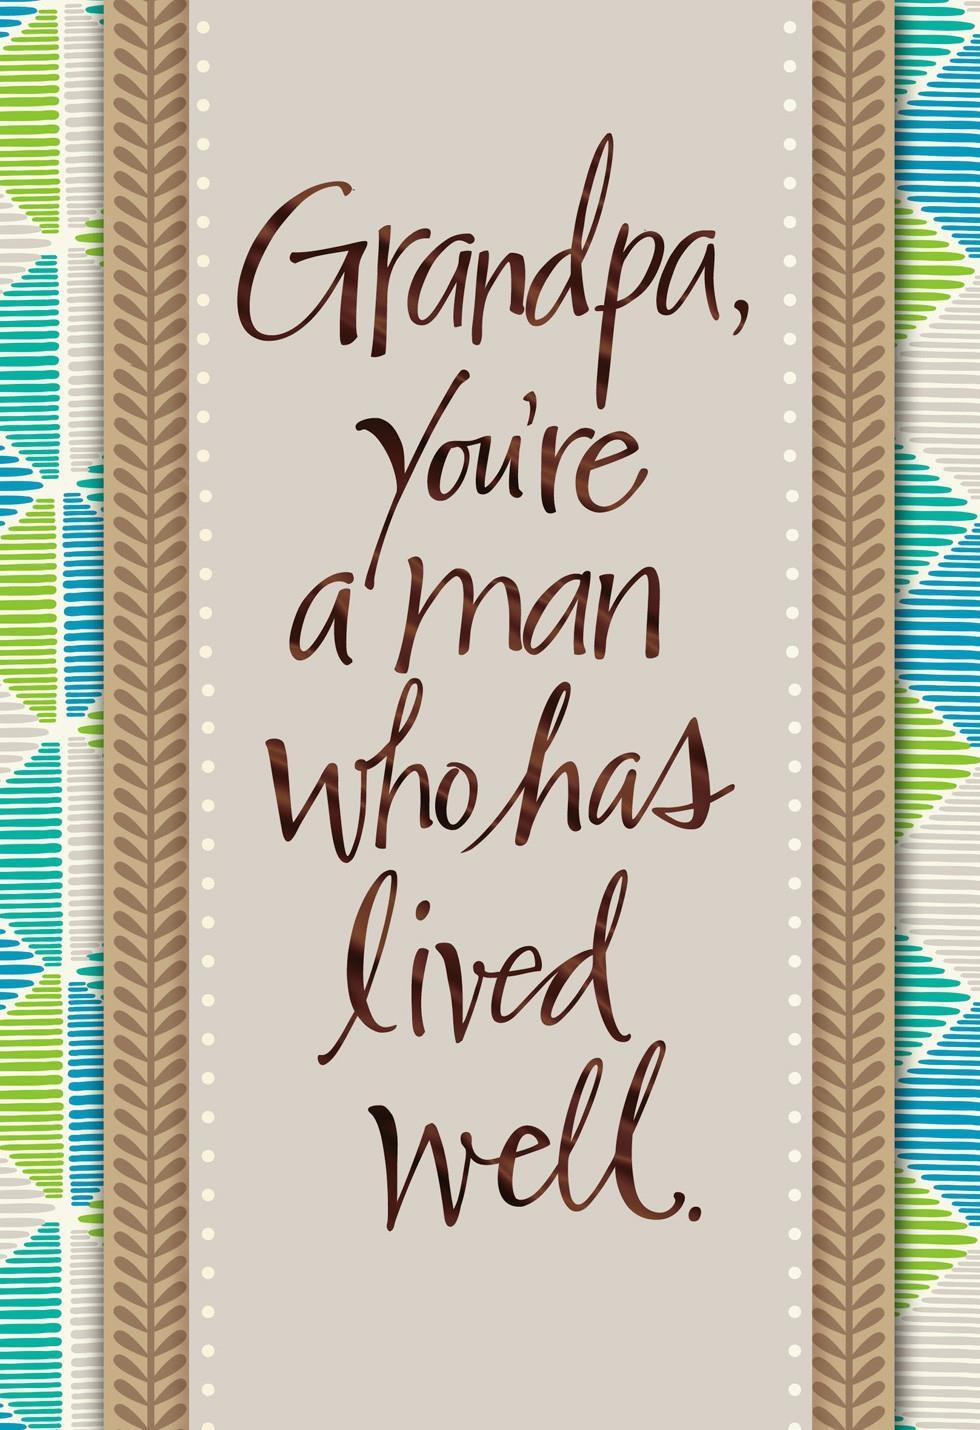 Life Well Lived Grandpa Birthday Card Greeting Cards Hallmark – Birthday Card Font